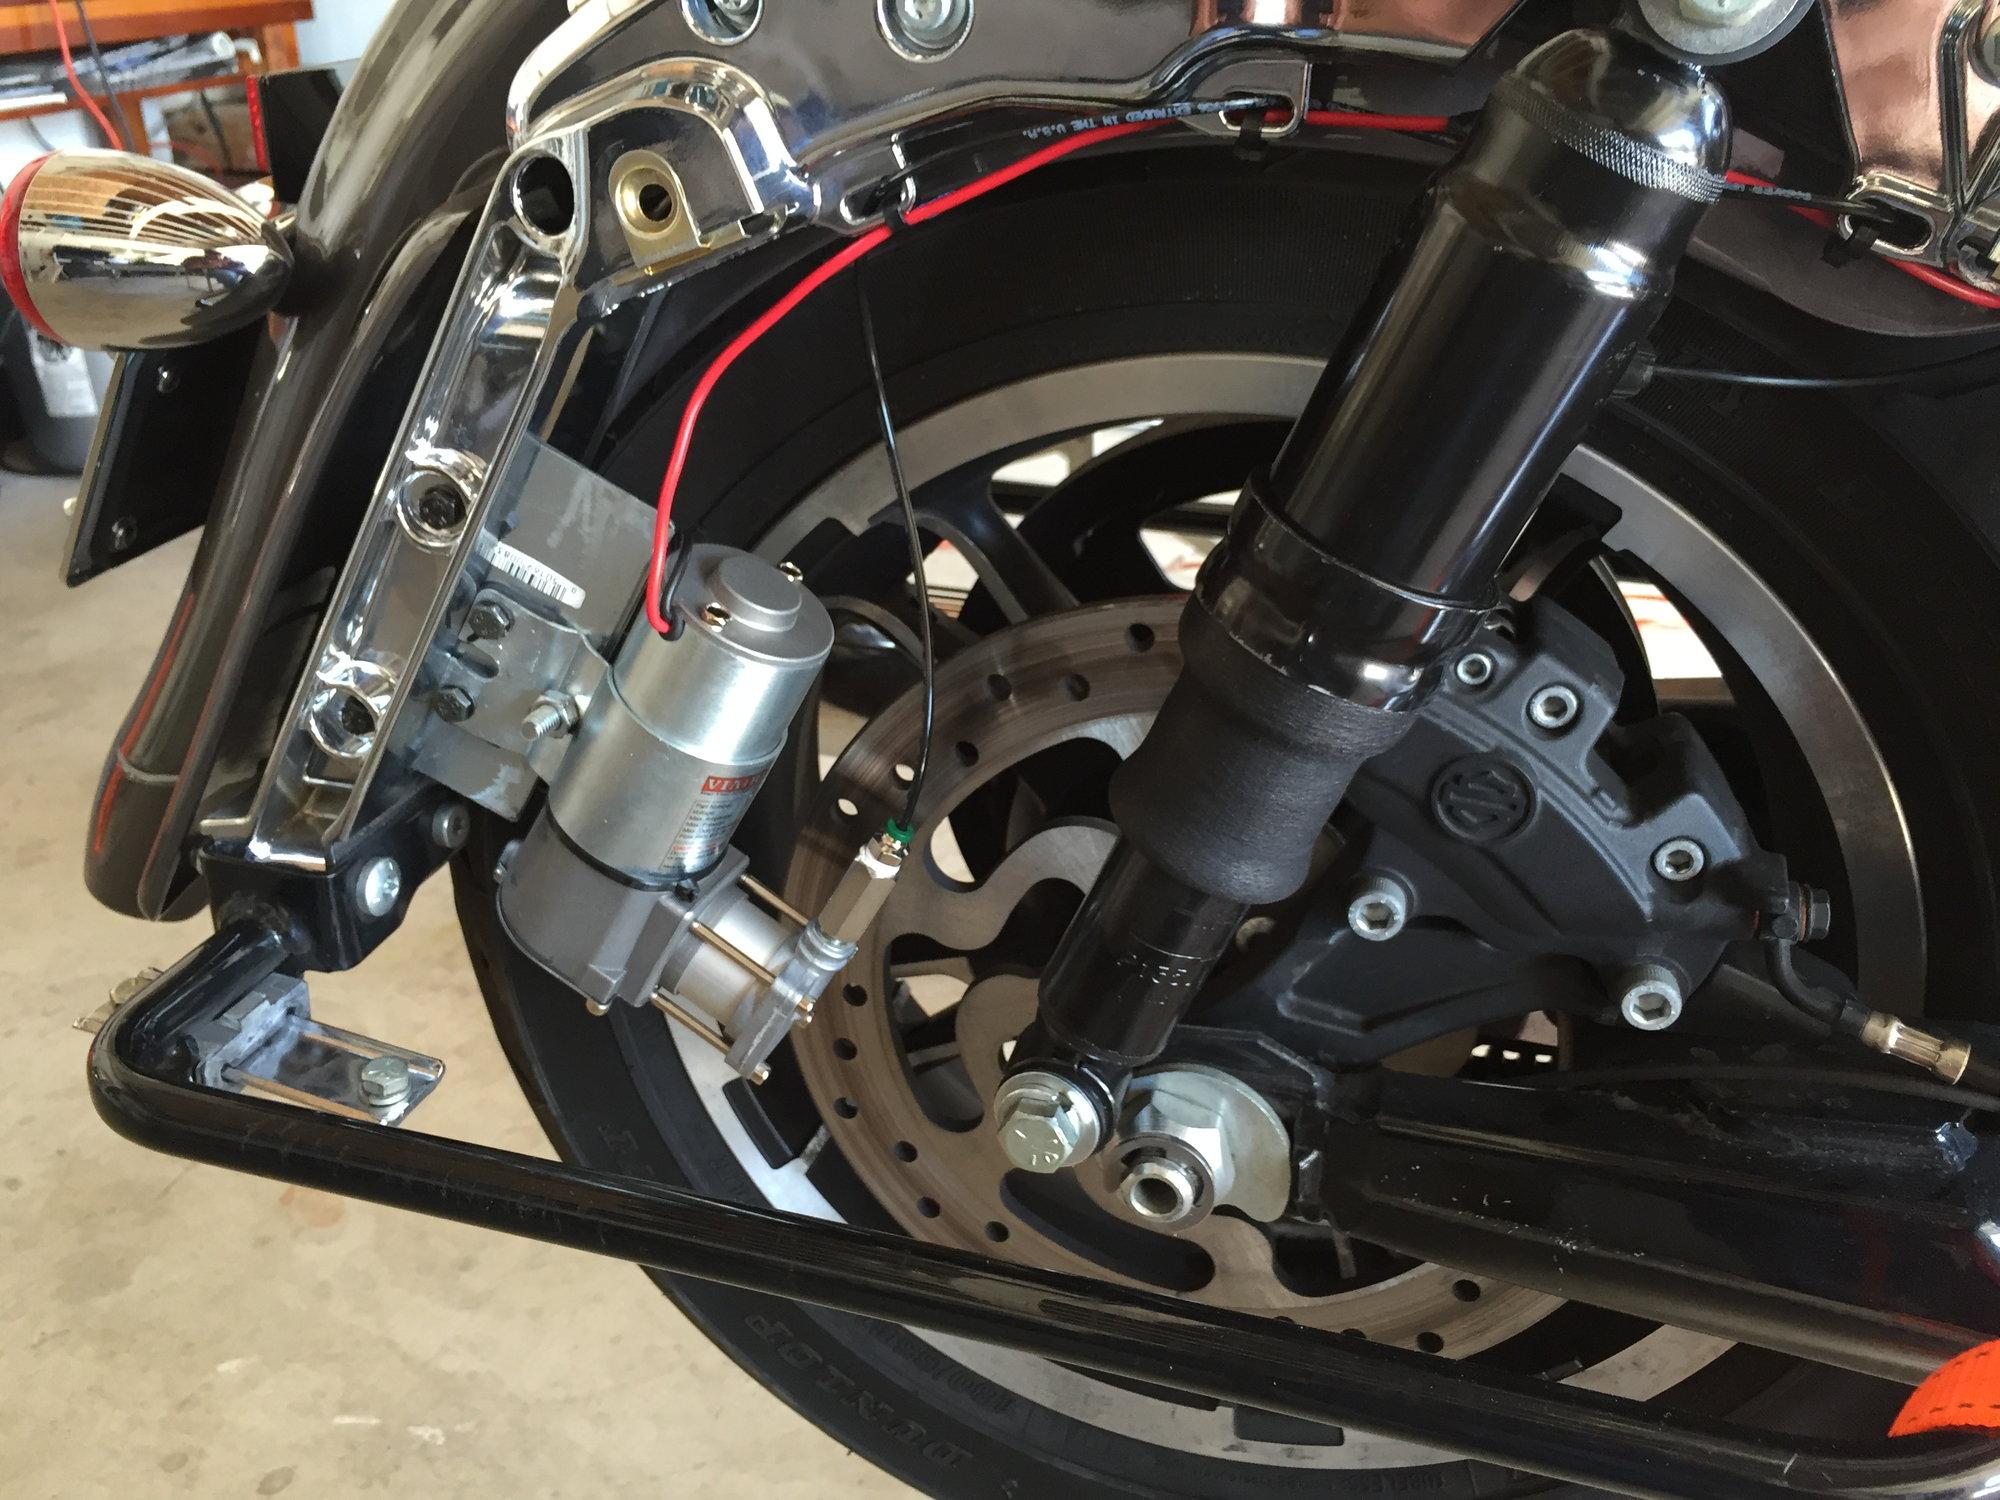 DIY Air ride wiring help?? - Harley Davidson Forums Harley Davidson Airride Wiring Diagram on